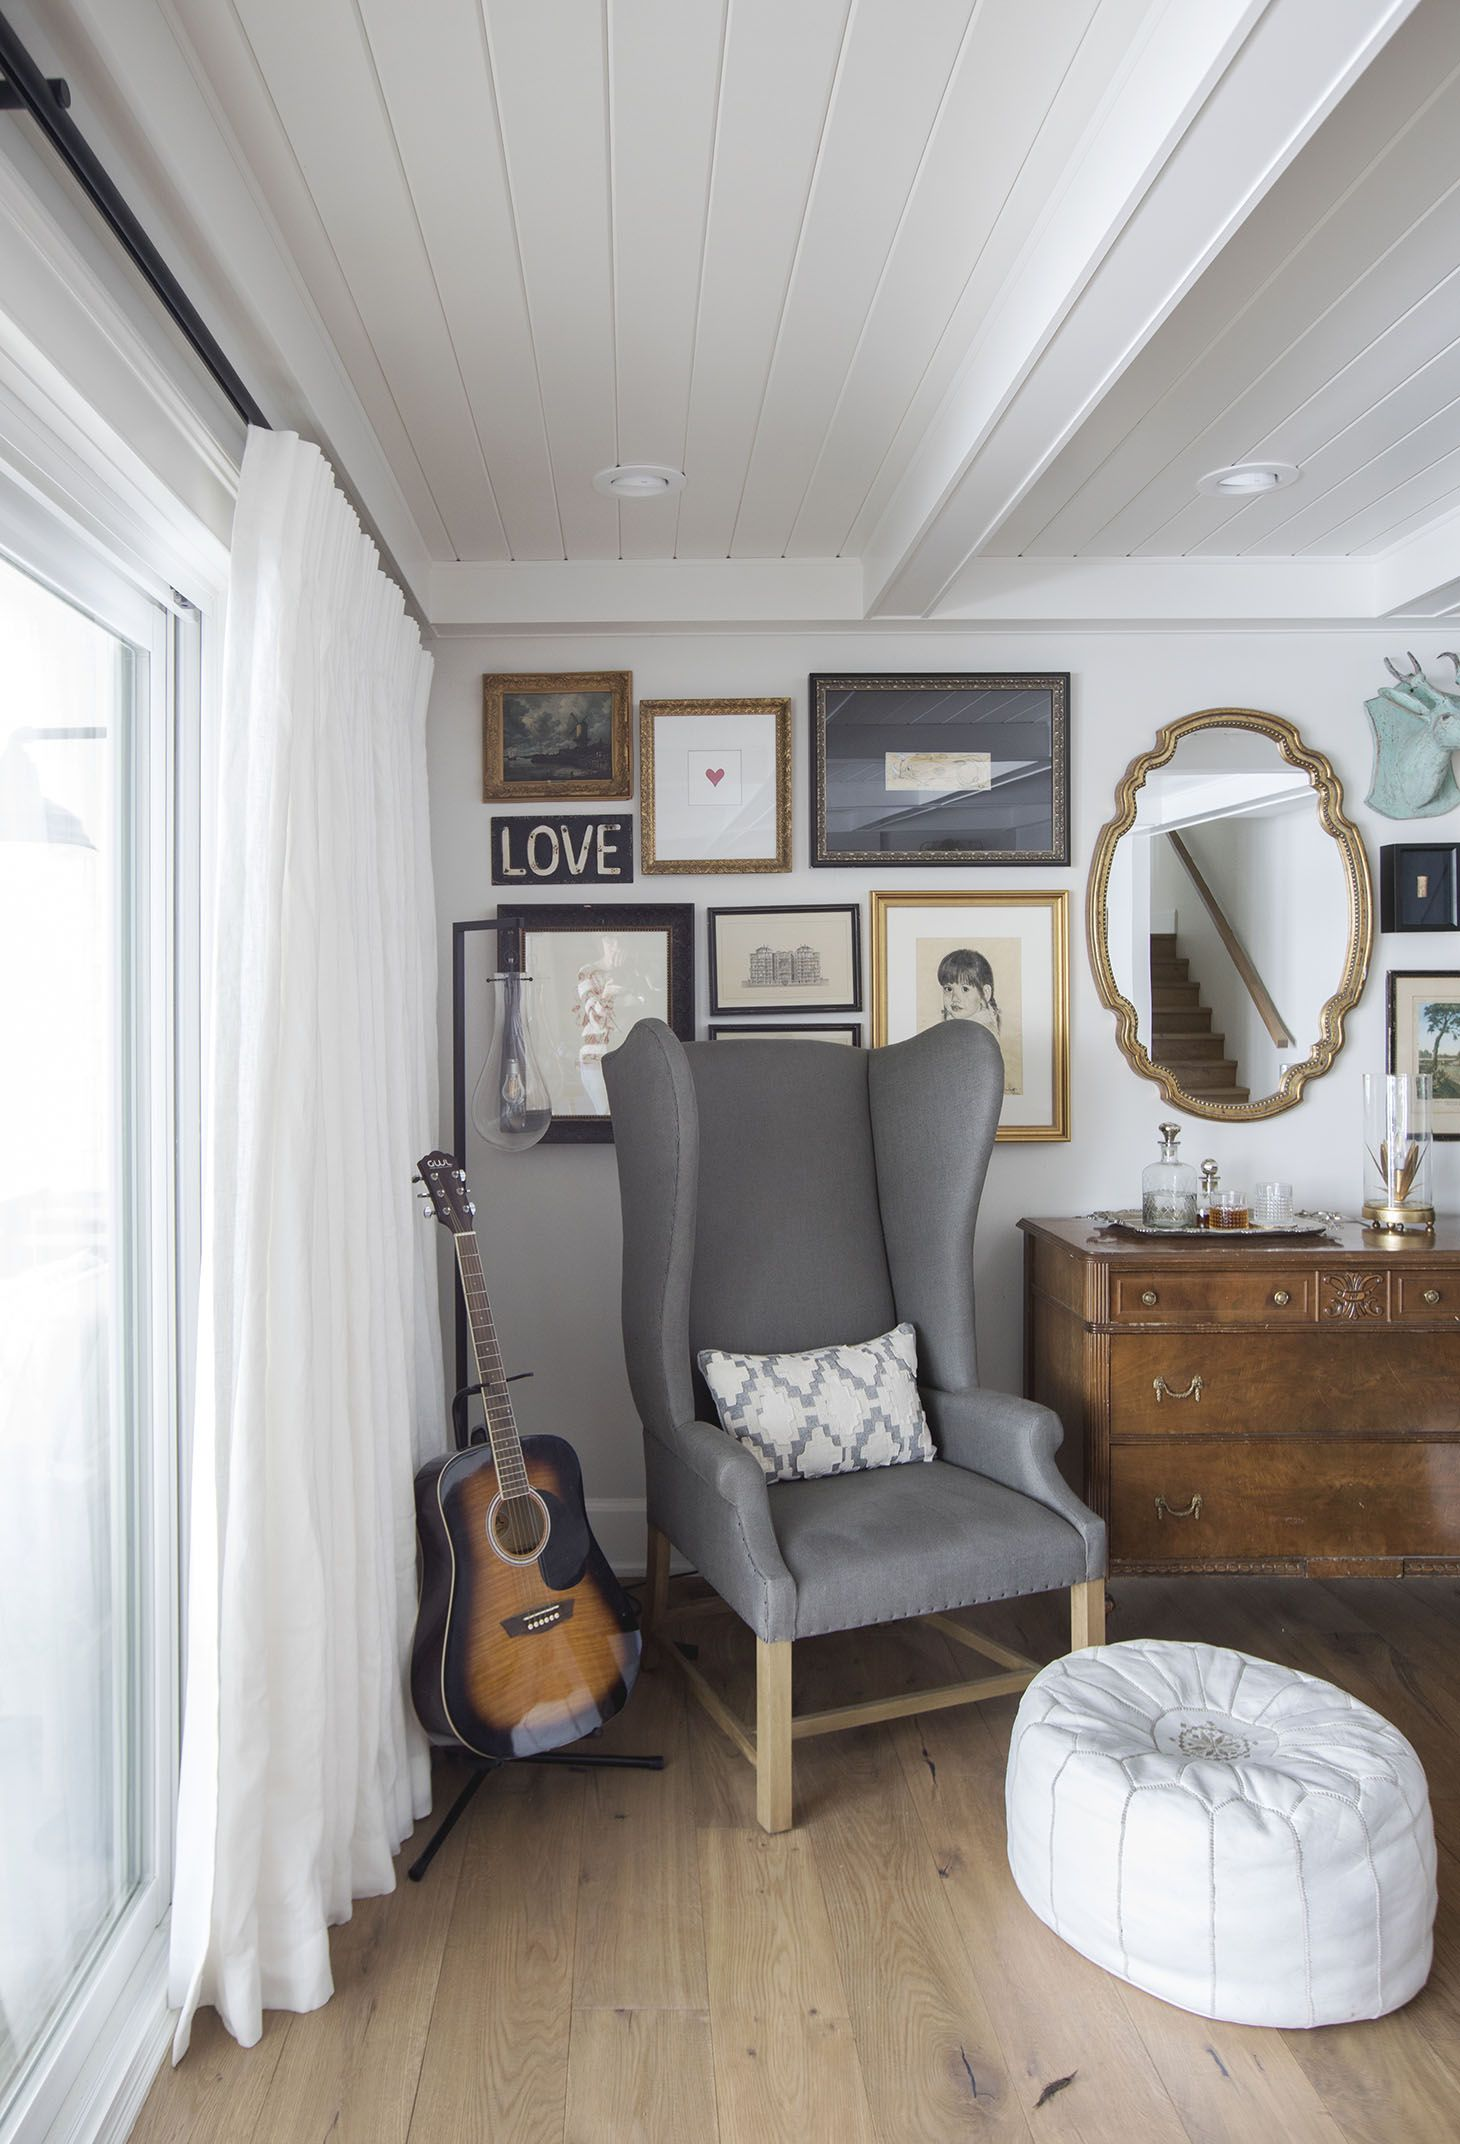 Home Tour Series: Rumpus Room